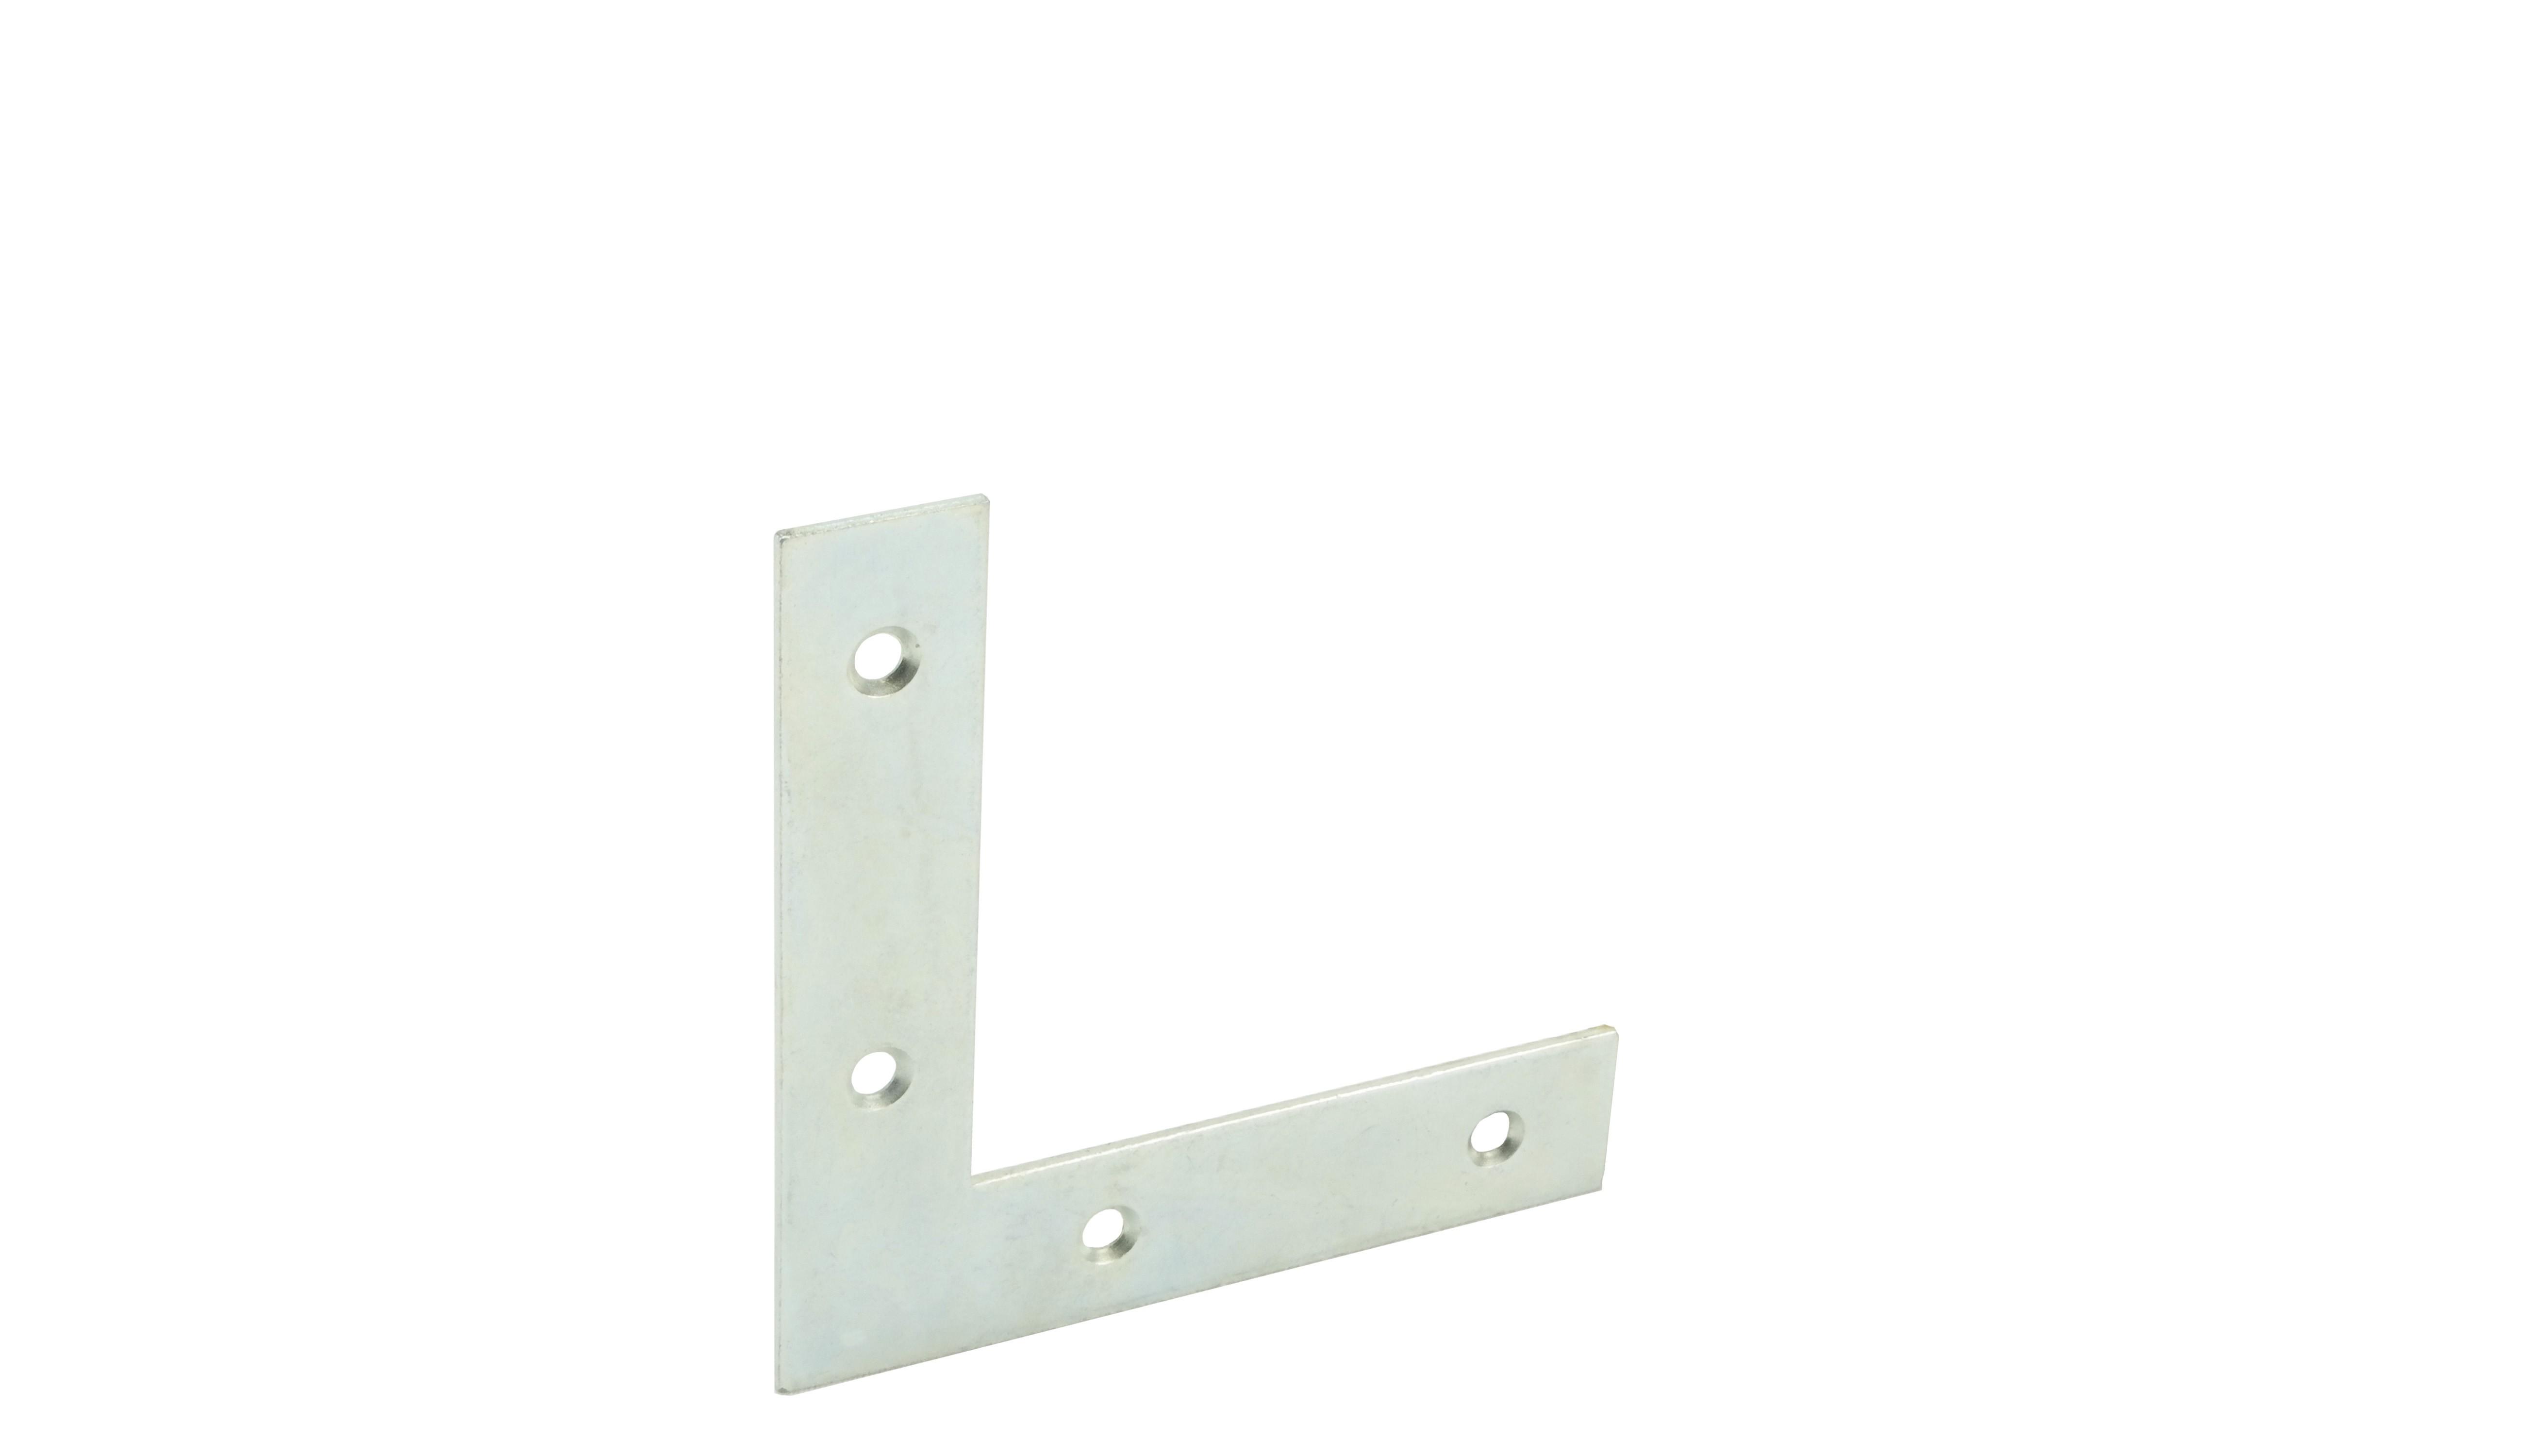 Flat corner iron flat 80x80 17x1,5 GA